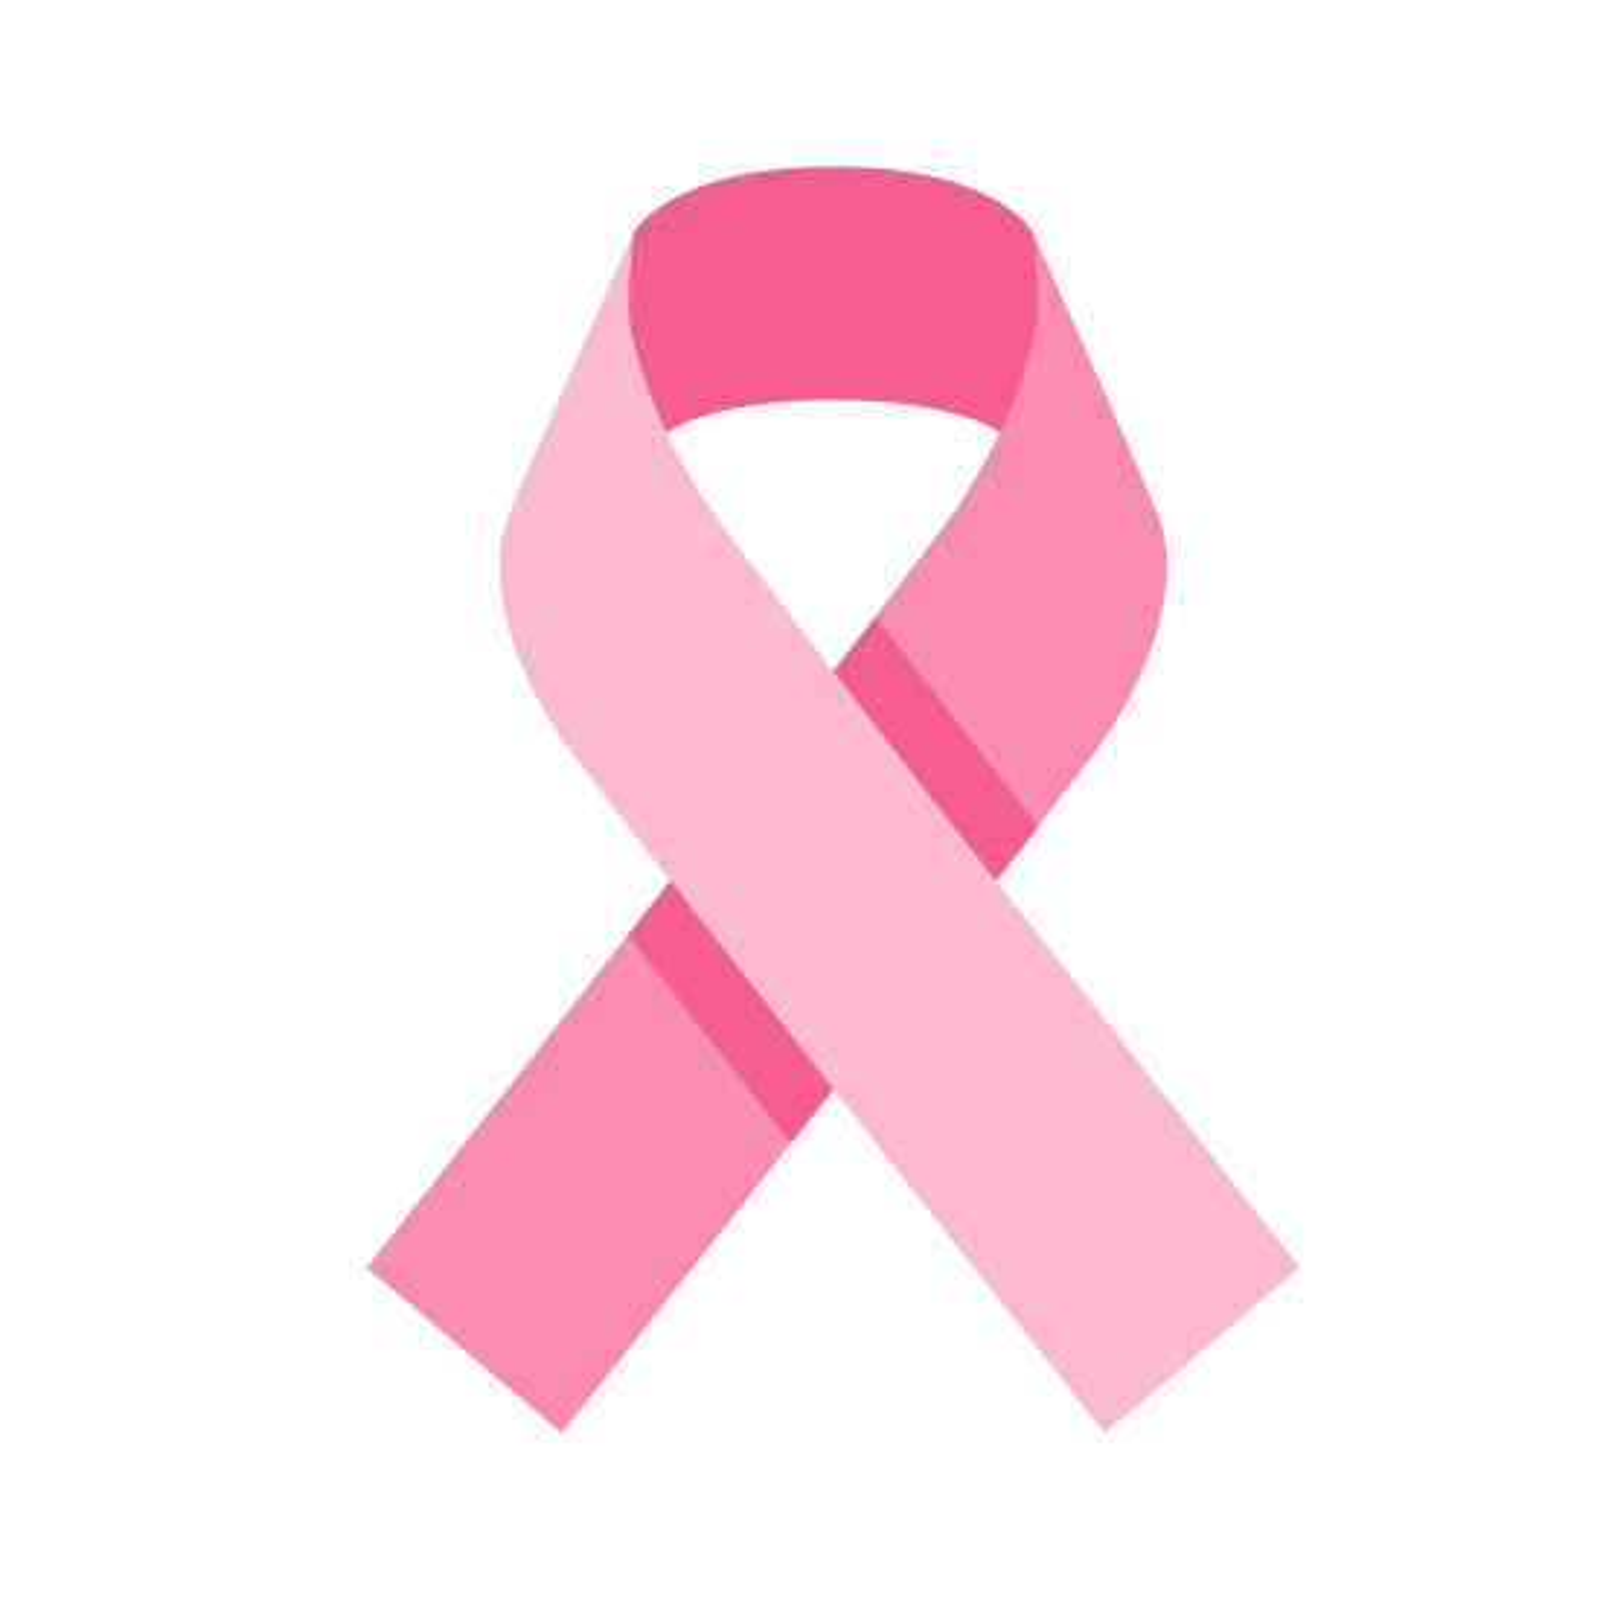 Pink Ribbon icon